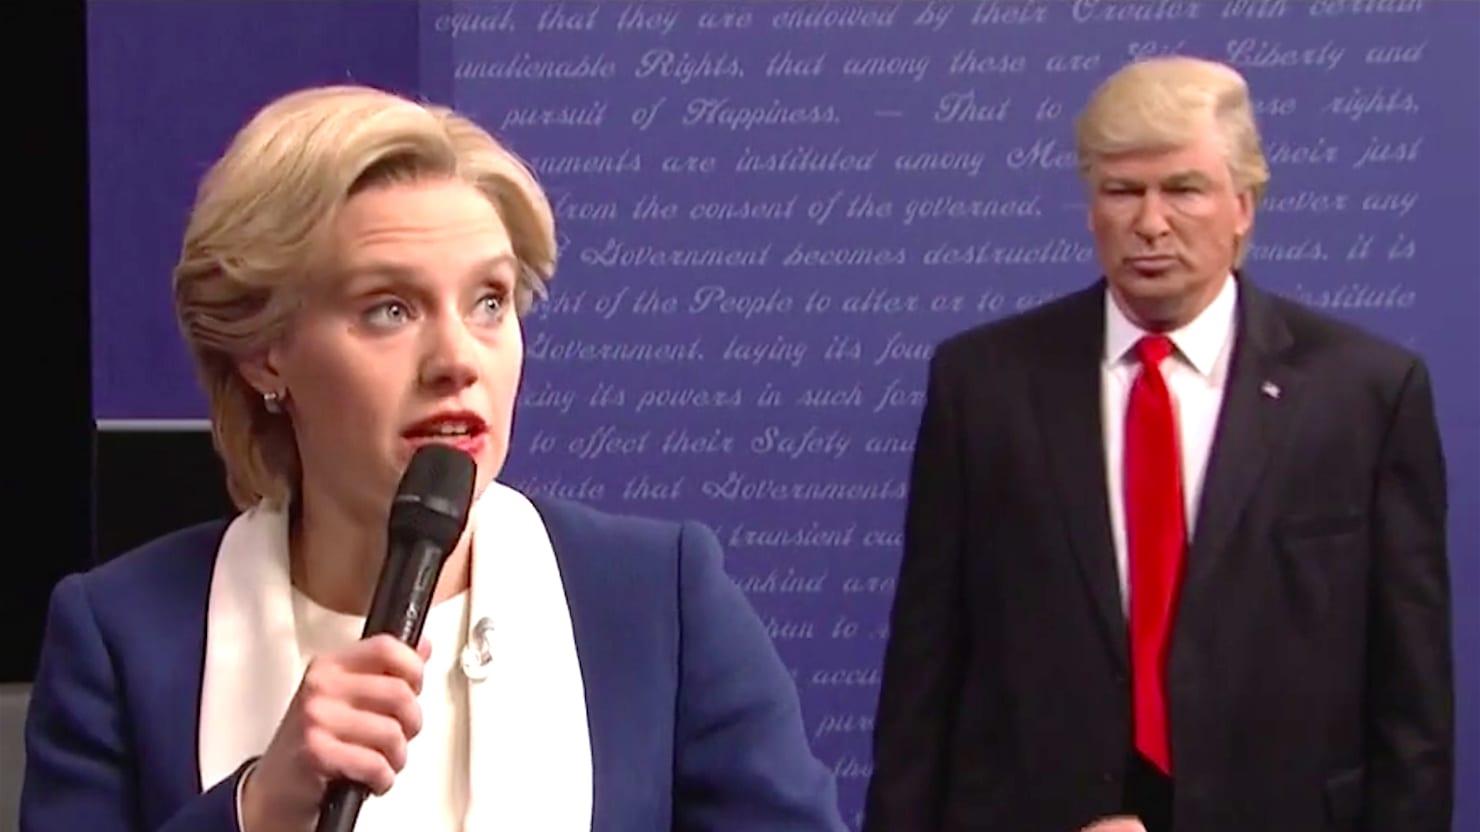 SNL Debate: Baldwin's Trump Hands the Election to 'President Clinton'